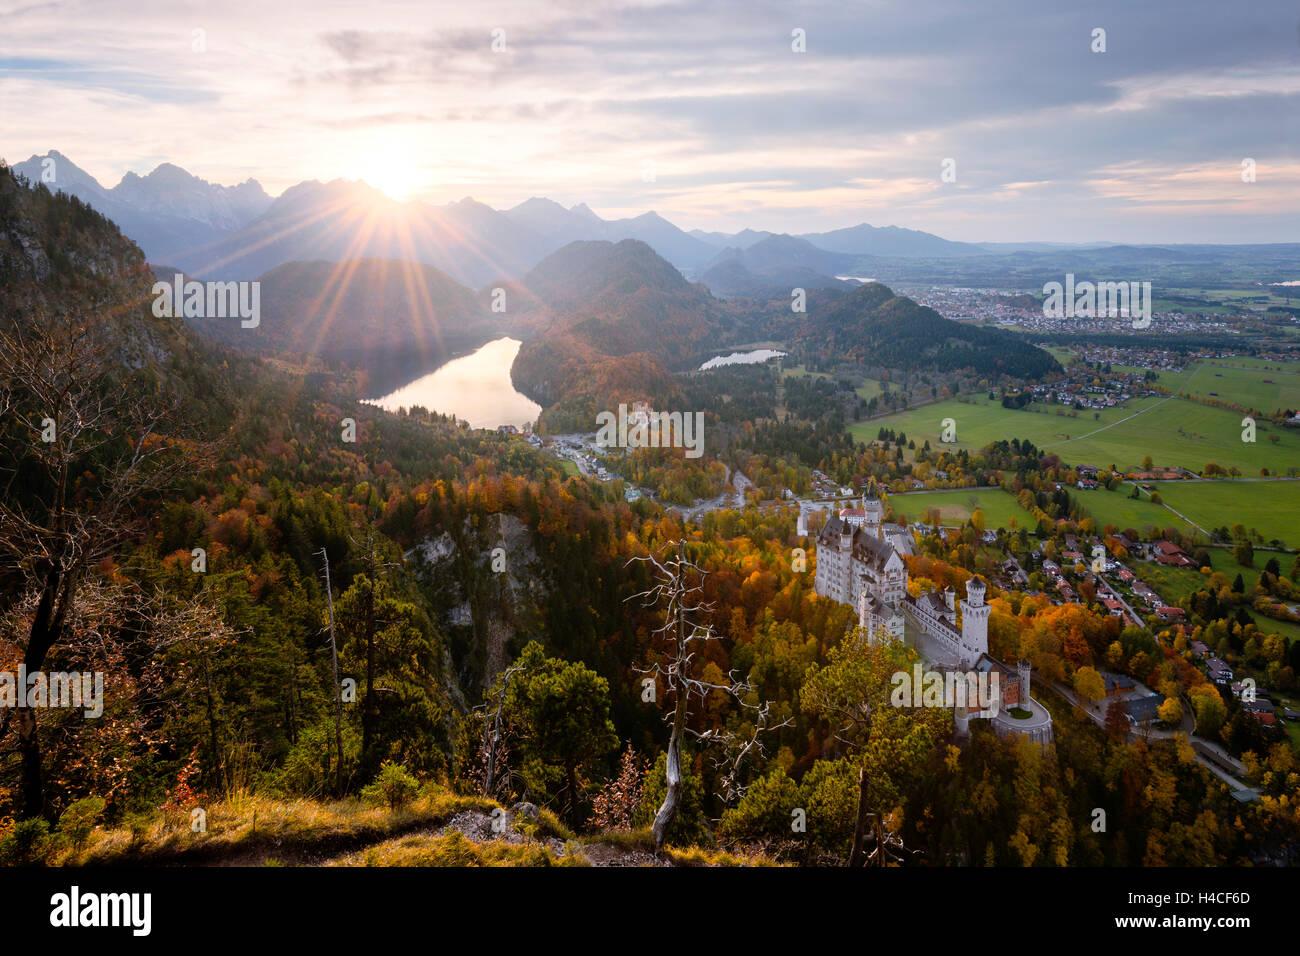 Germany, Bavaria, castle, Neuschwanstein, sun, back light, mountains, Alps, royal castle, fairy tale king, Ludwig, - Stock Image